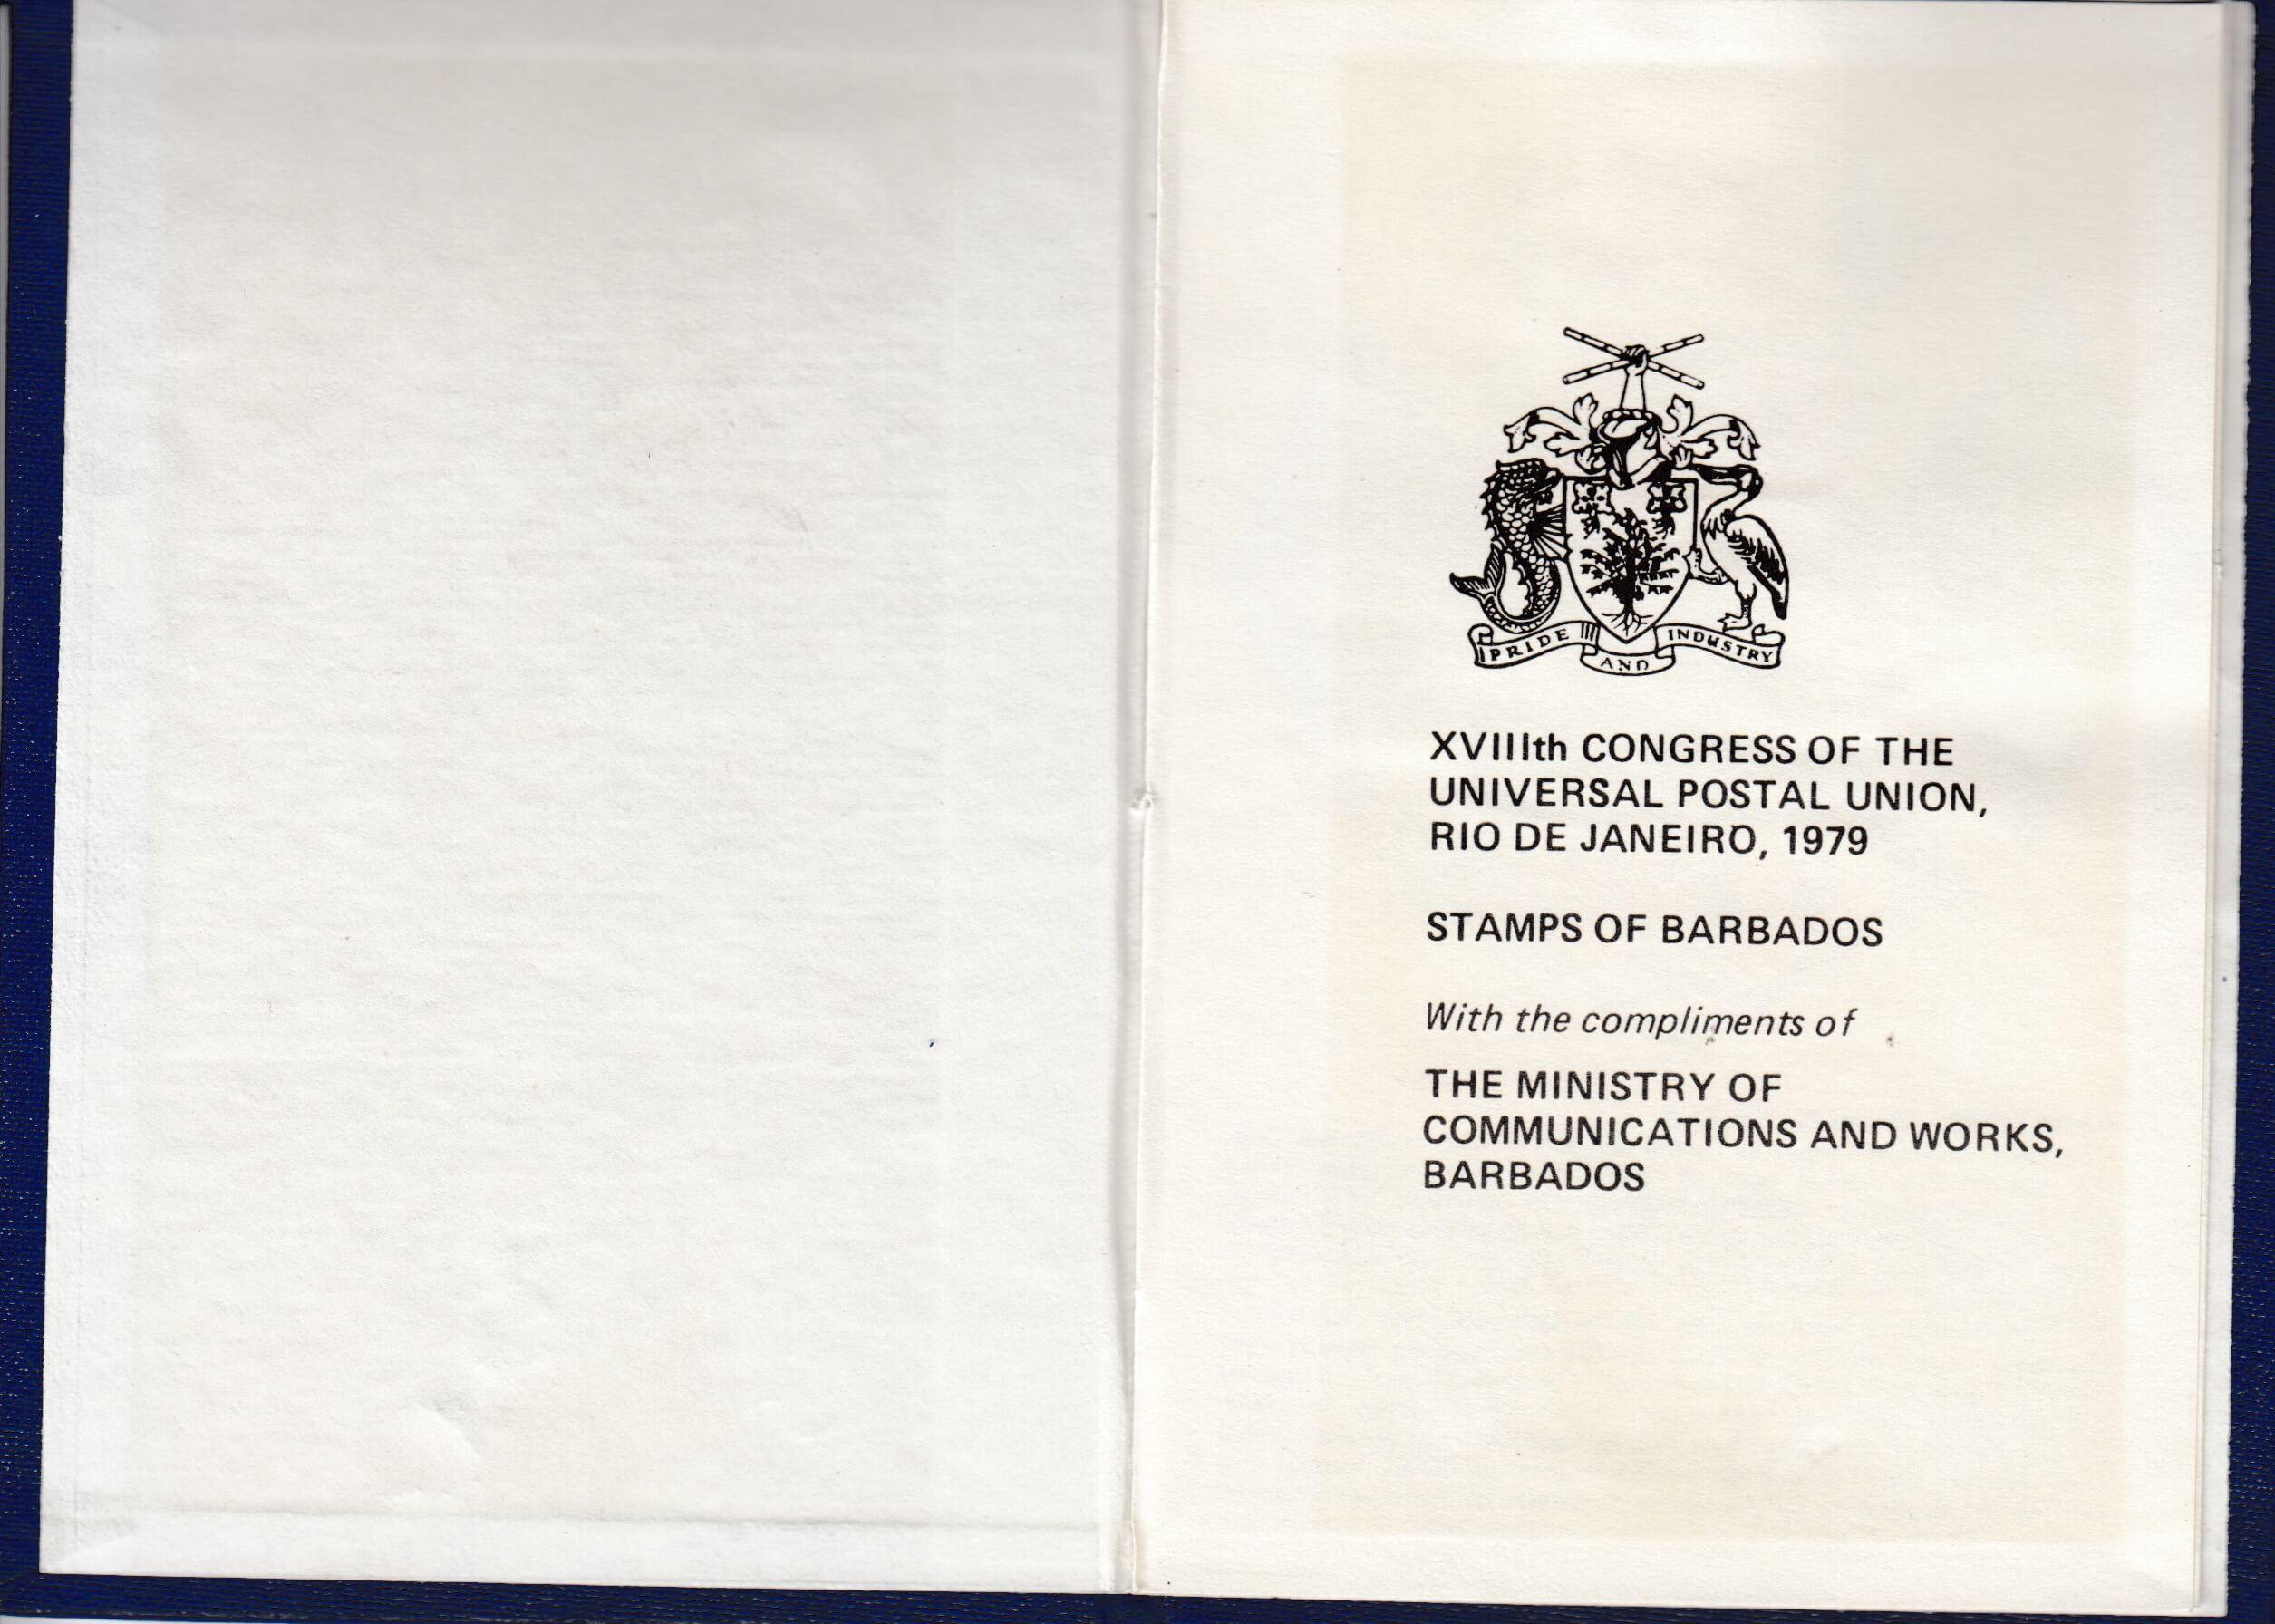 XVIIIth Congress of the Universal Postal Union, Rio de Janeiro 1979 - Barbados stamp booklet inner cover